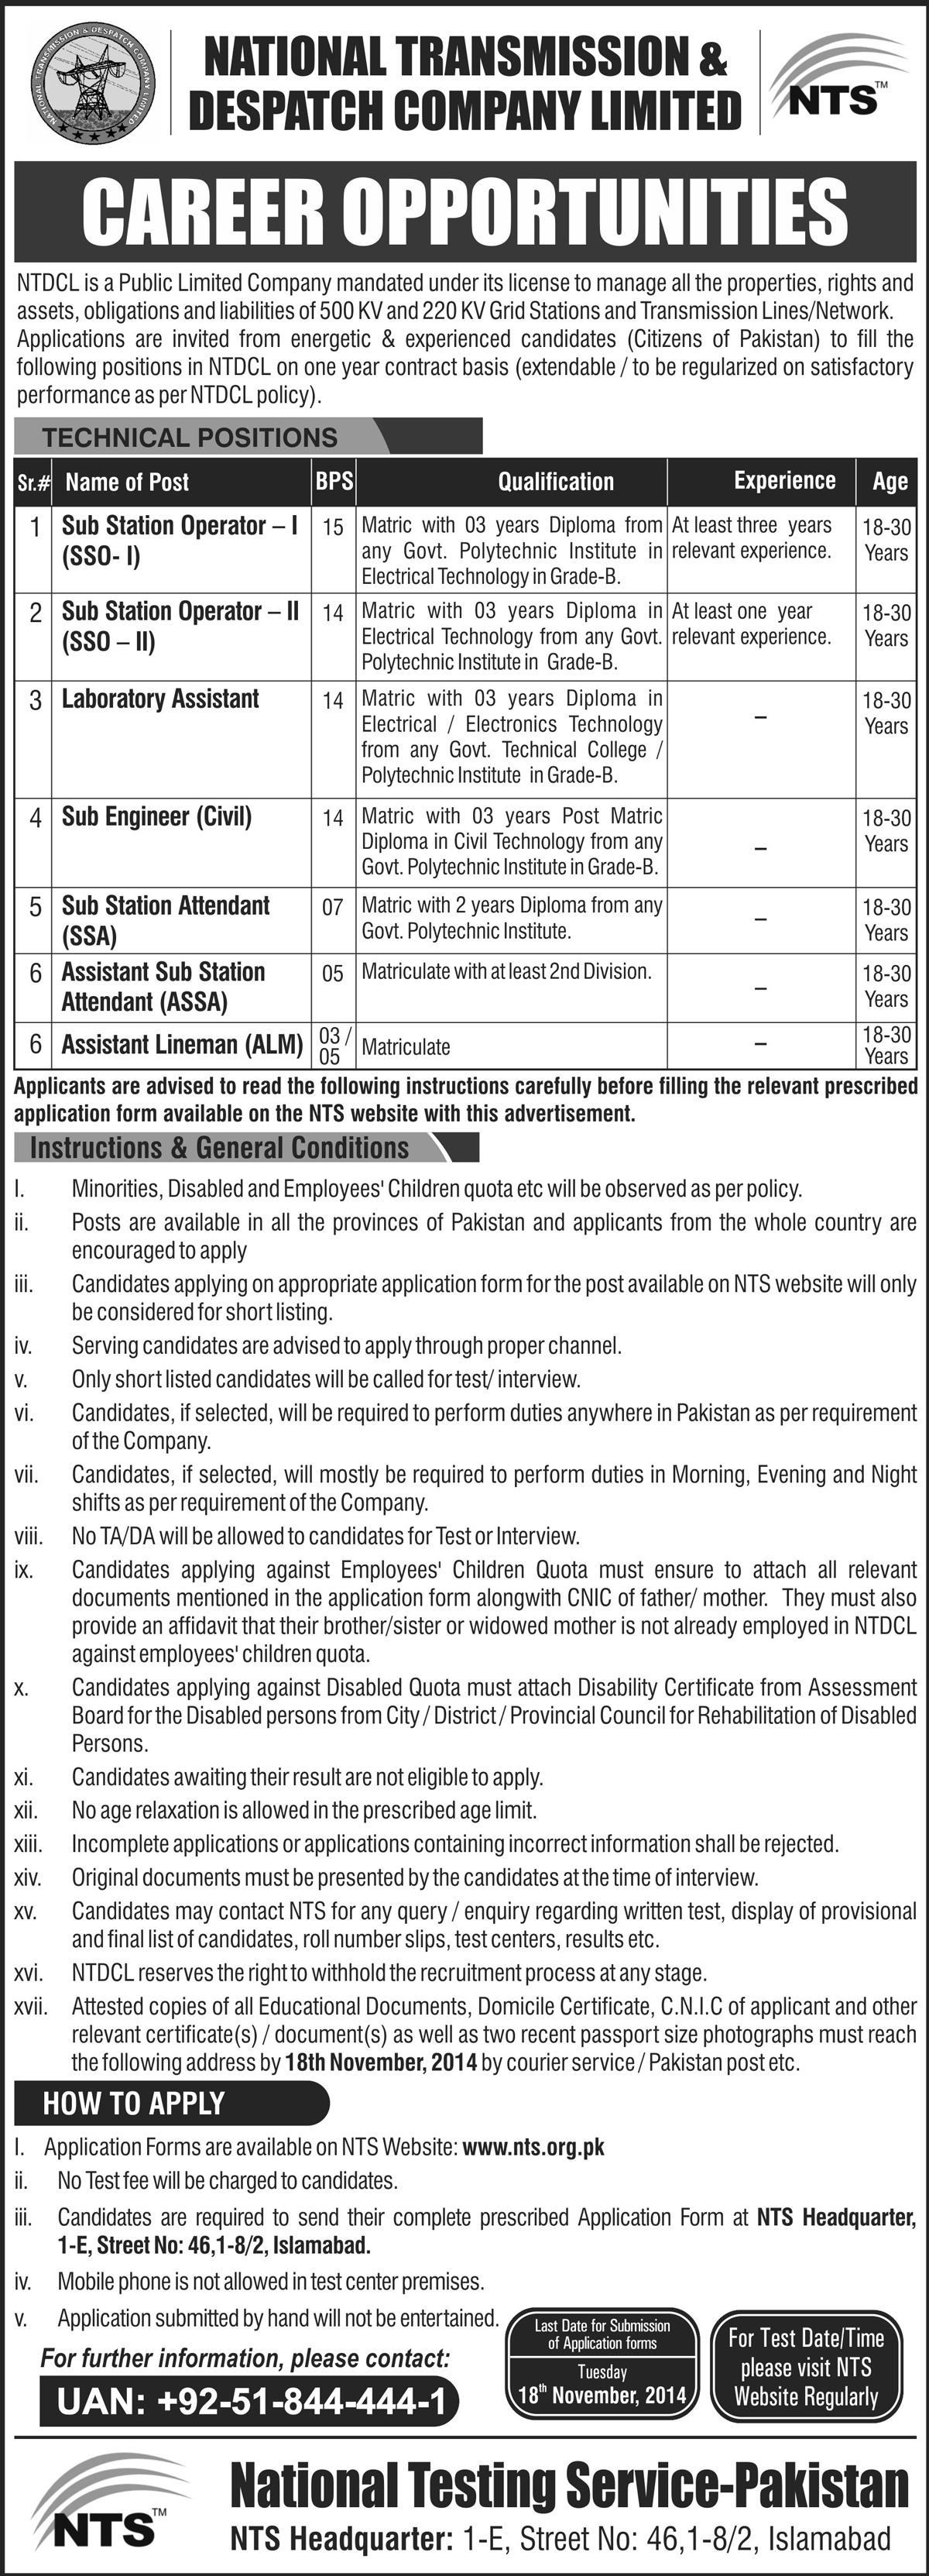 NTDC NTS Job 2014 Application Form Download - sekho com pk